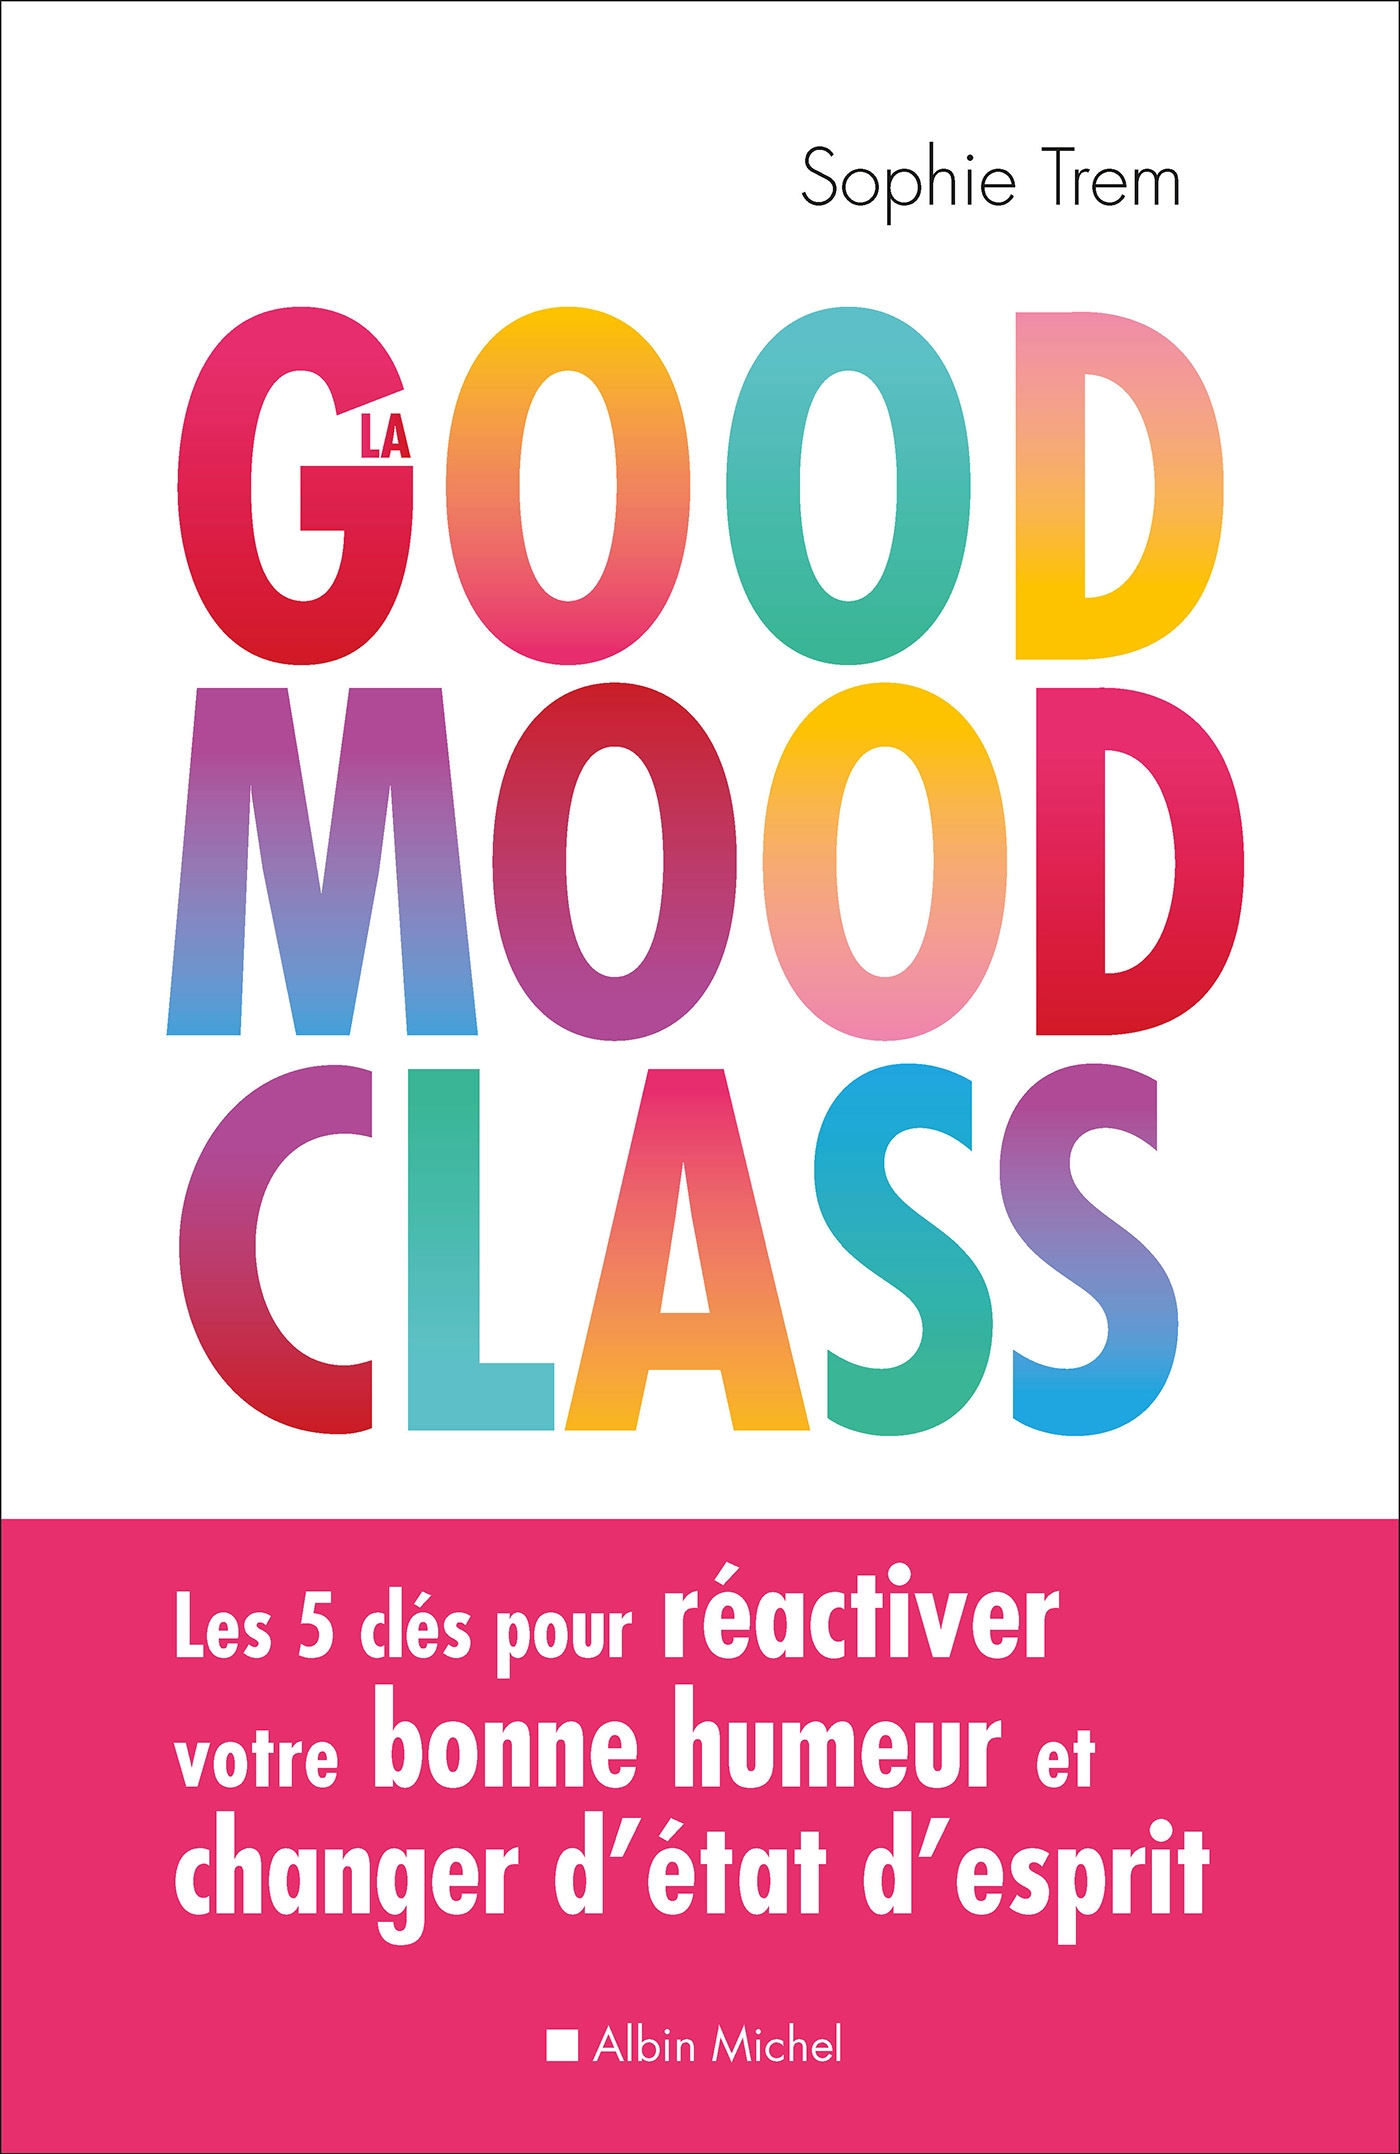 La Good mood class |